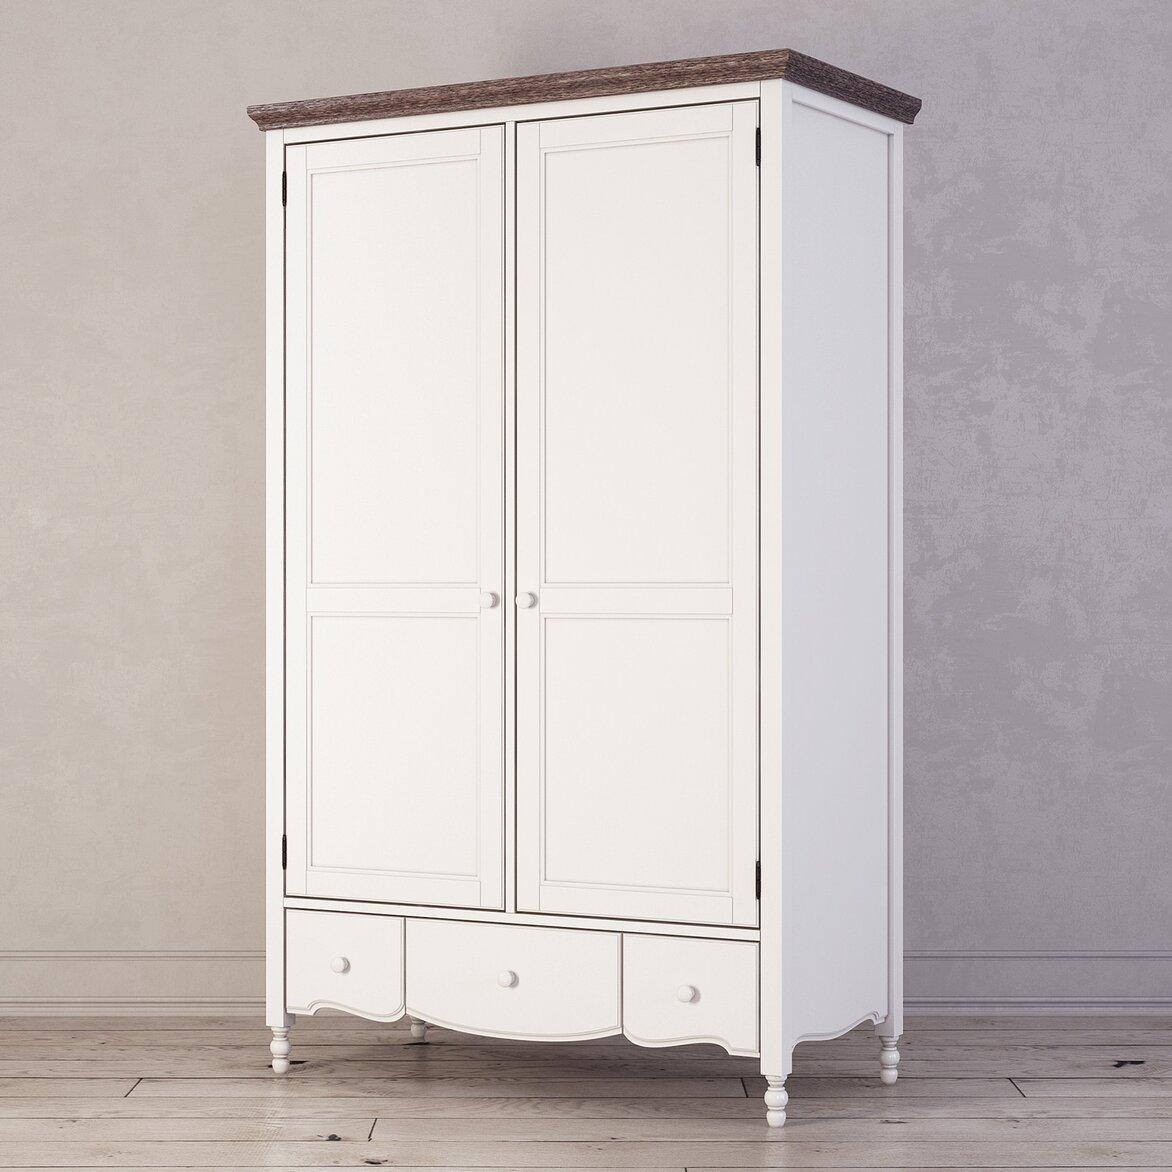 Шкаф двухстворчатый Leblanc, белый (полуоборот)